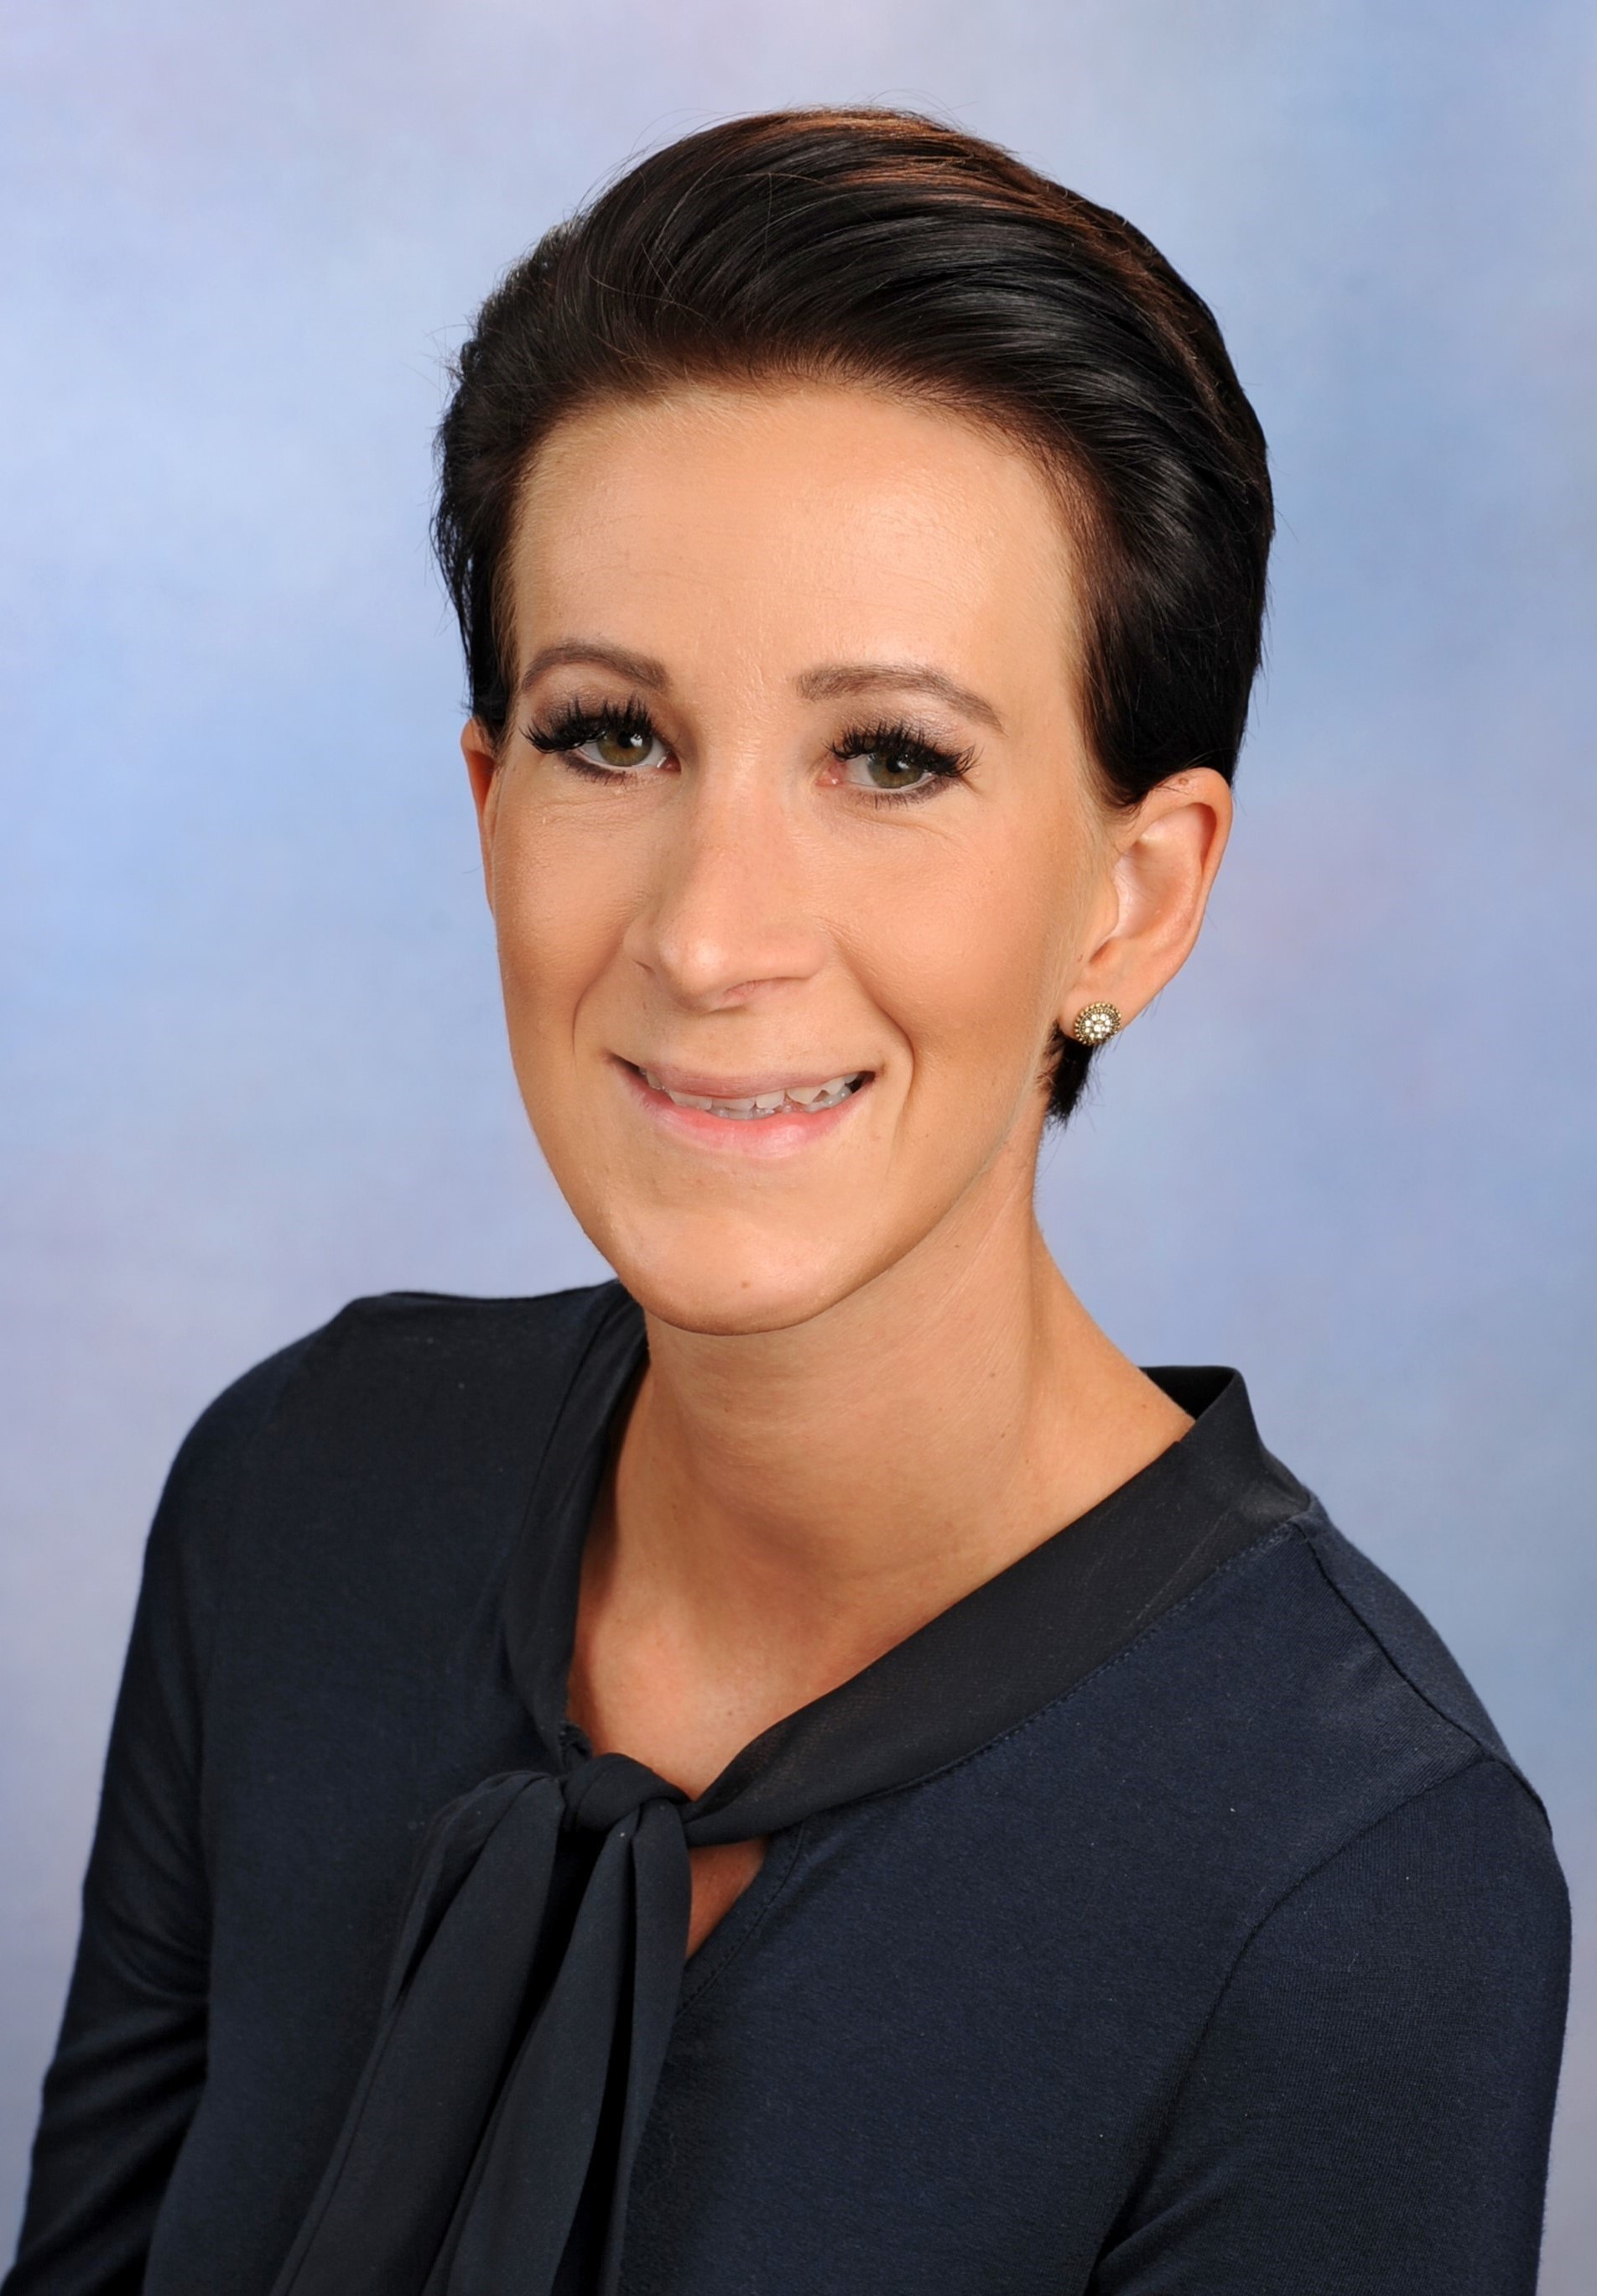 Nicole Lasinger, BEd.